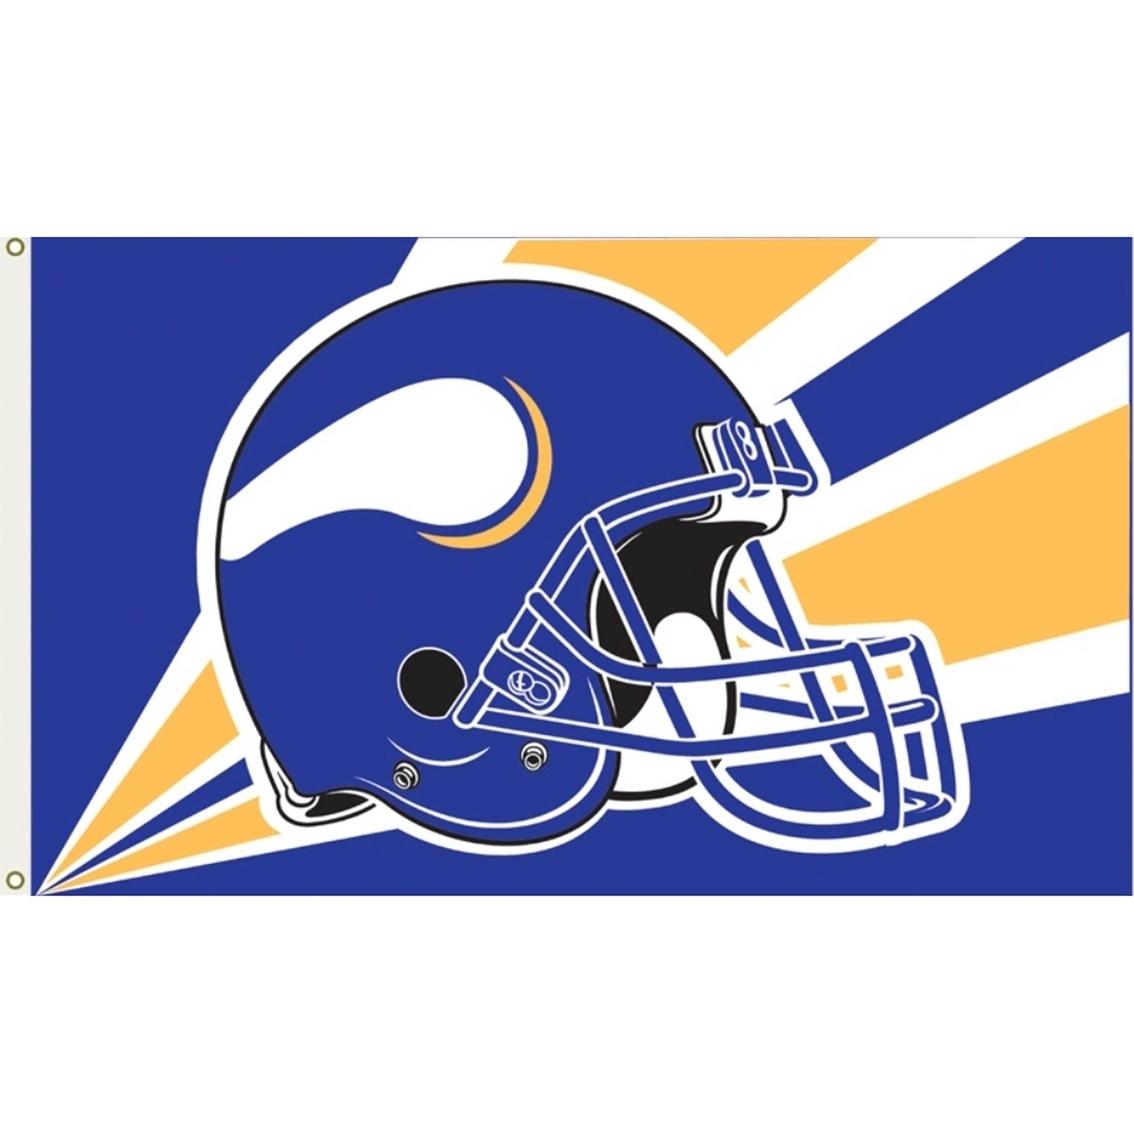 af941ebae7e Annin Nfl Minnesota Vikings 3 Ft. X 5 Ft. Flag